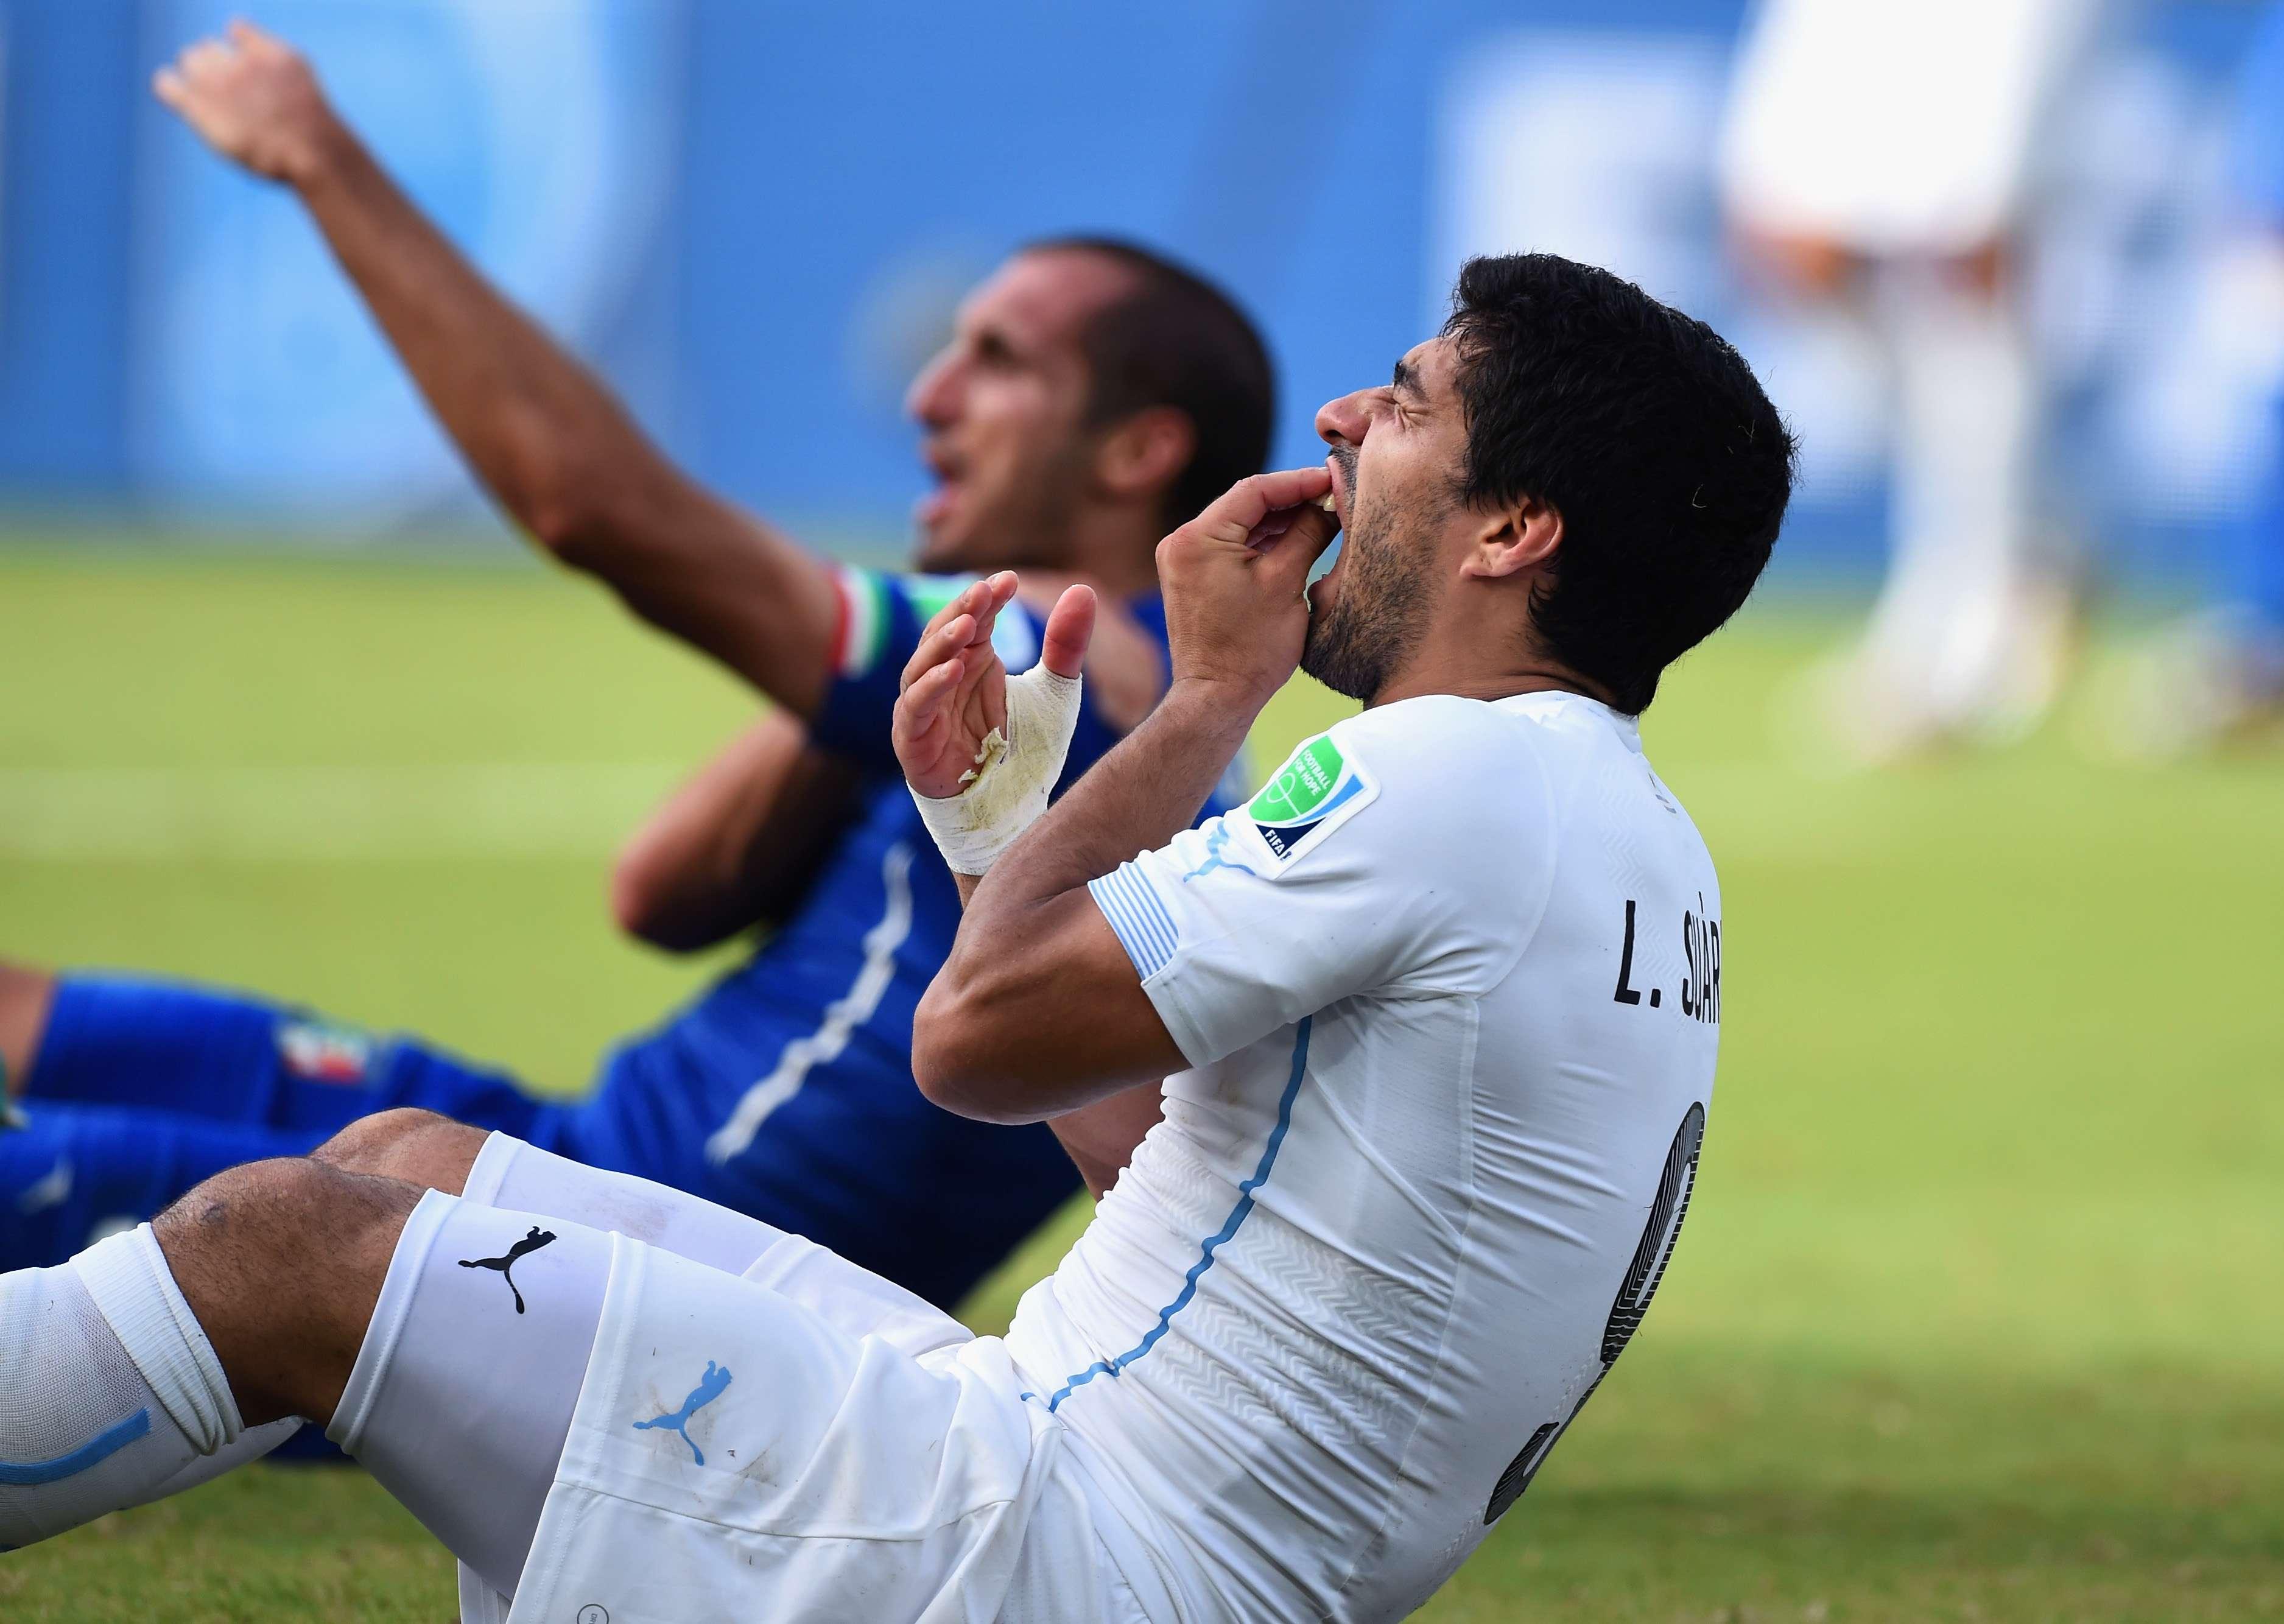 Uruguaio agrediu o zagueiro italiano nesta terça-feira, em Natal Foto: Getty Images